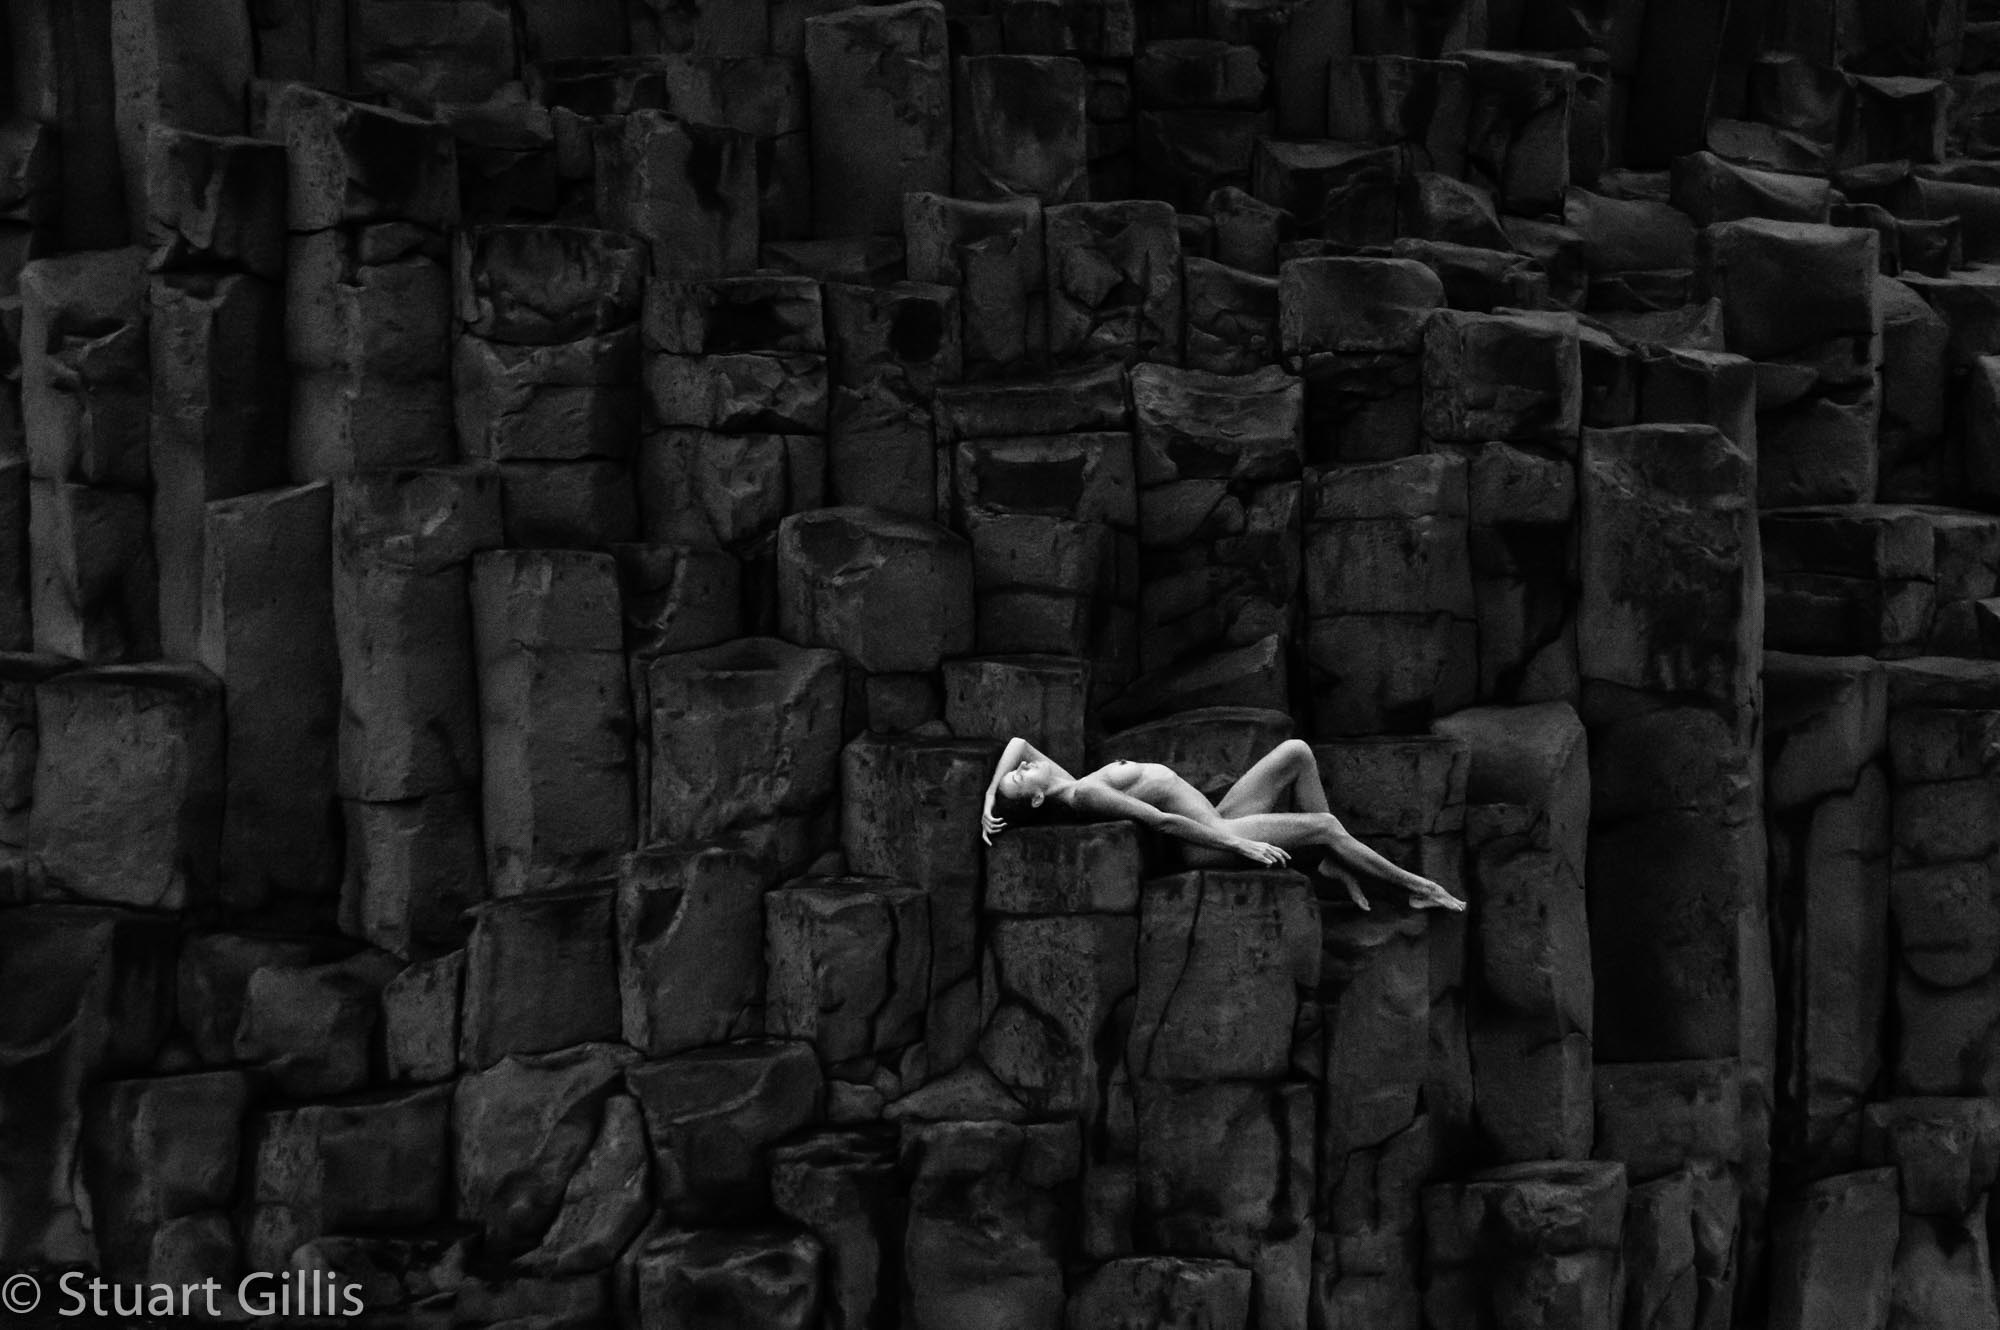 On the rocks by Stuart Gillis